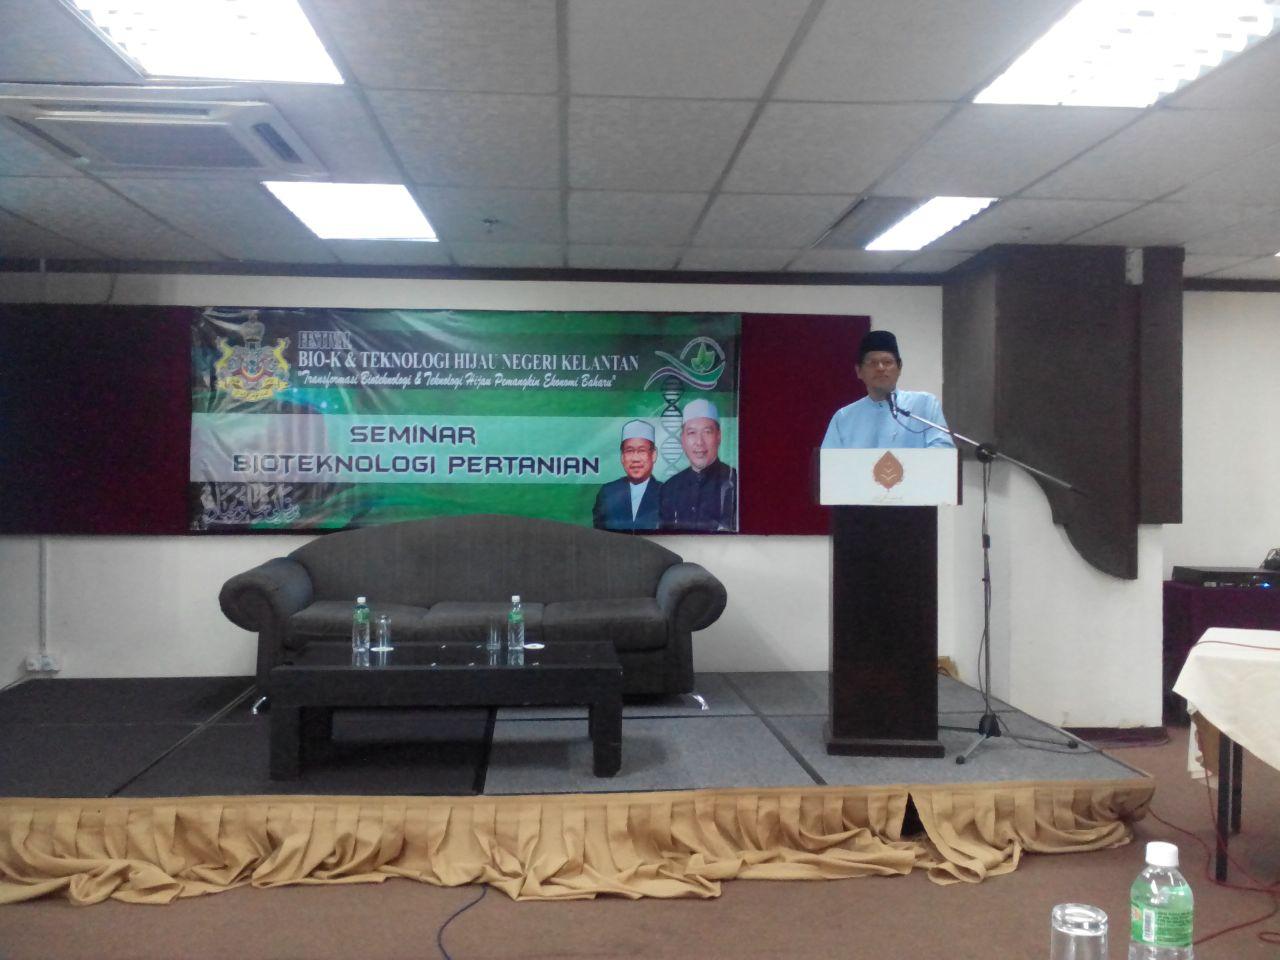 Prof Wan Mohtar